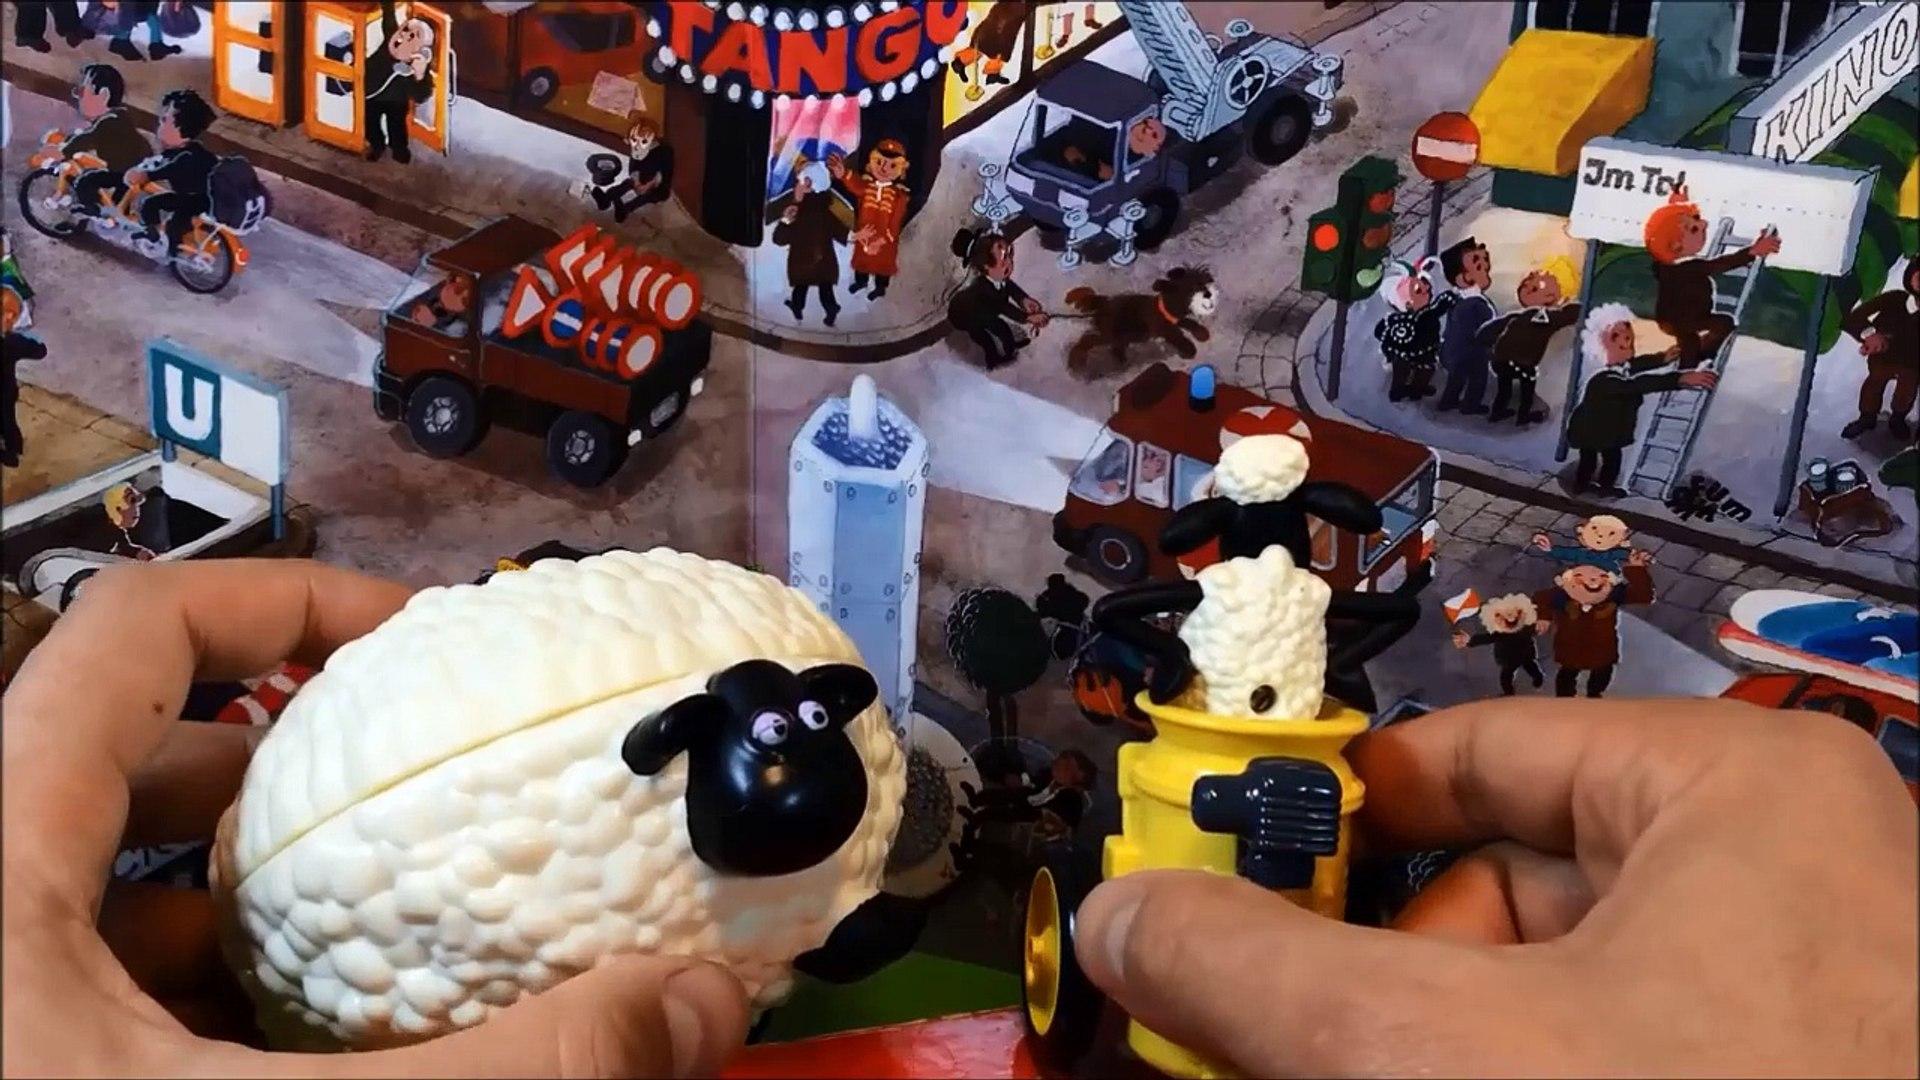 Shaun le mouton Shaun the Sheep 8 stories | McDonalds toys | Timmy Time | CBeebies | Shaun le mouton